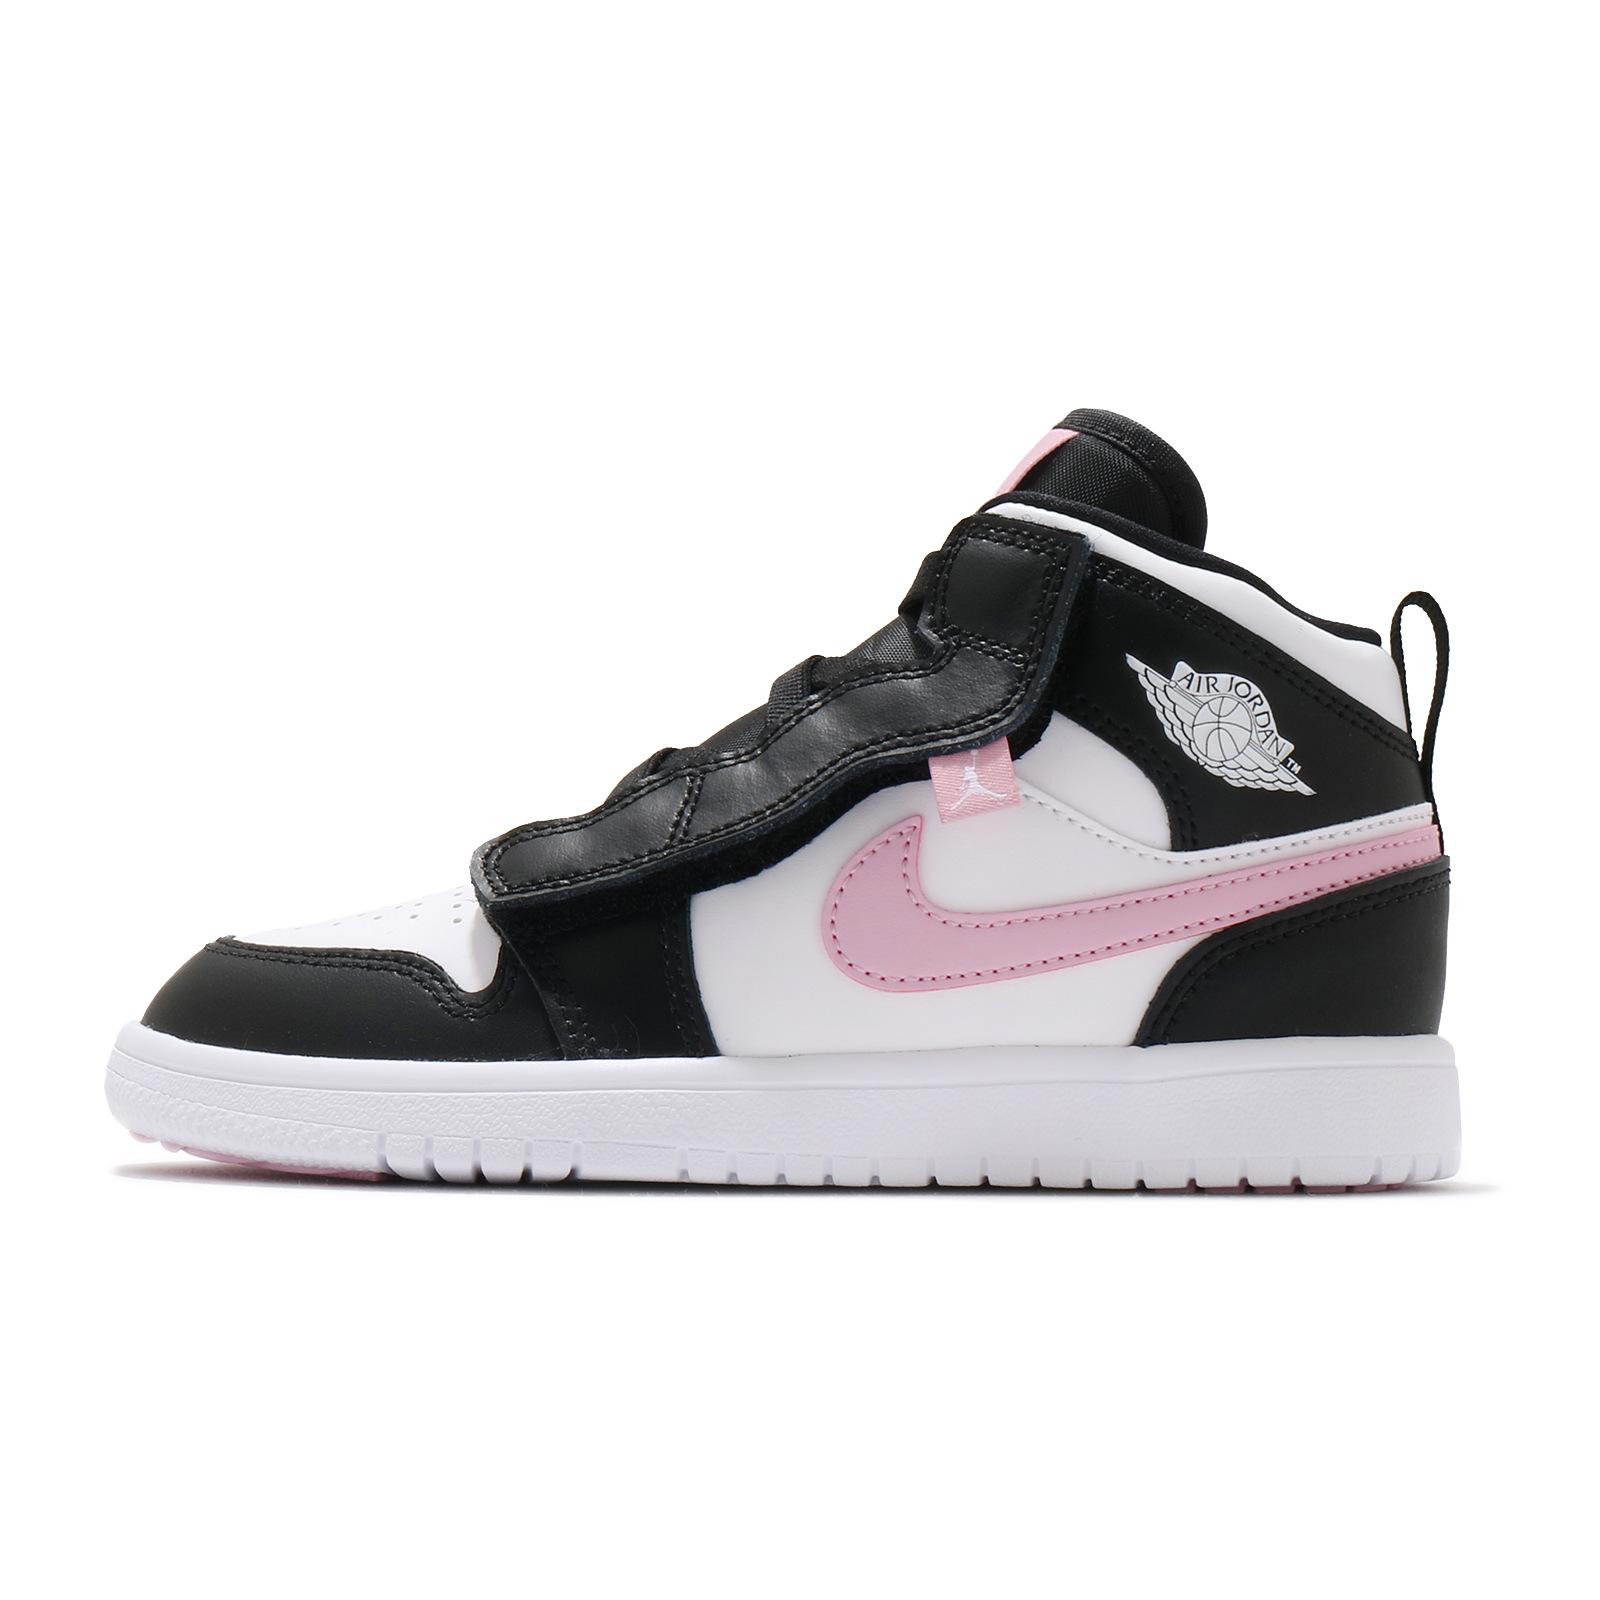 Nike 童鞋 Jordan 1 Mid ALT PS 黑 白 粉紅 喬丹 女孩 小朋友【ACS】 AT4612-103